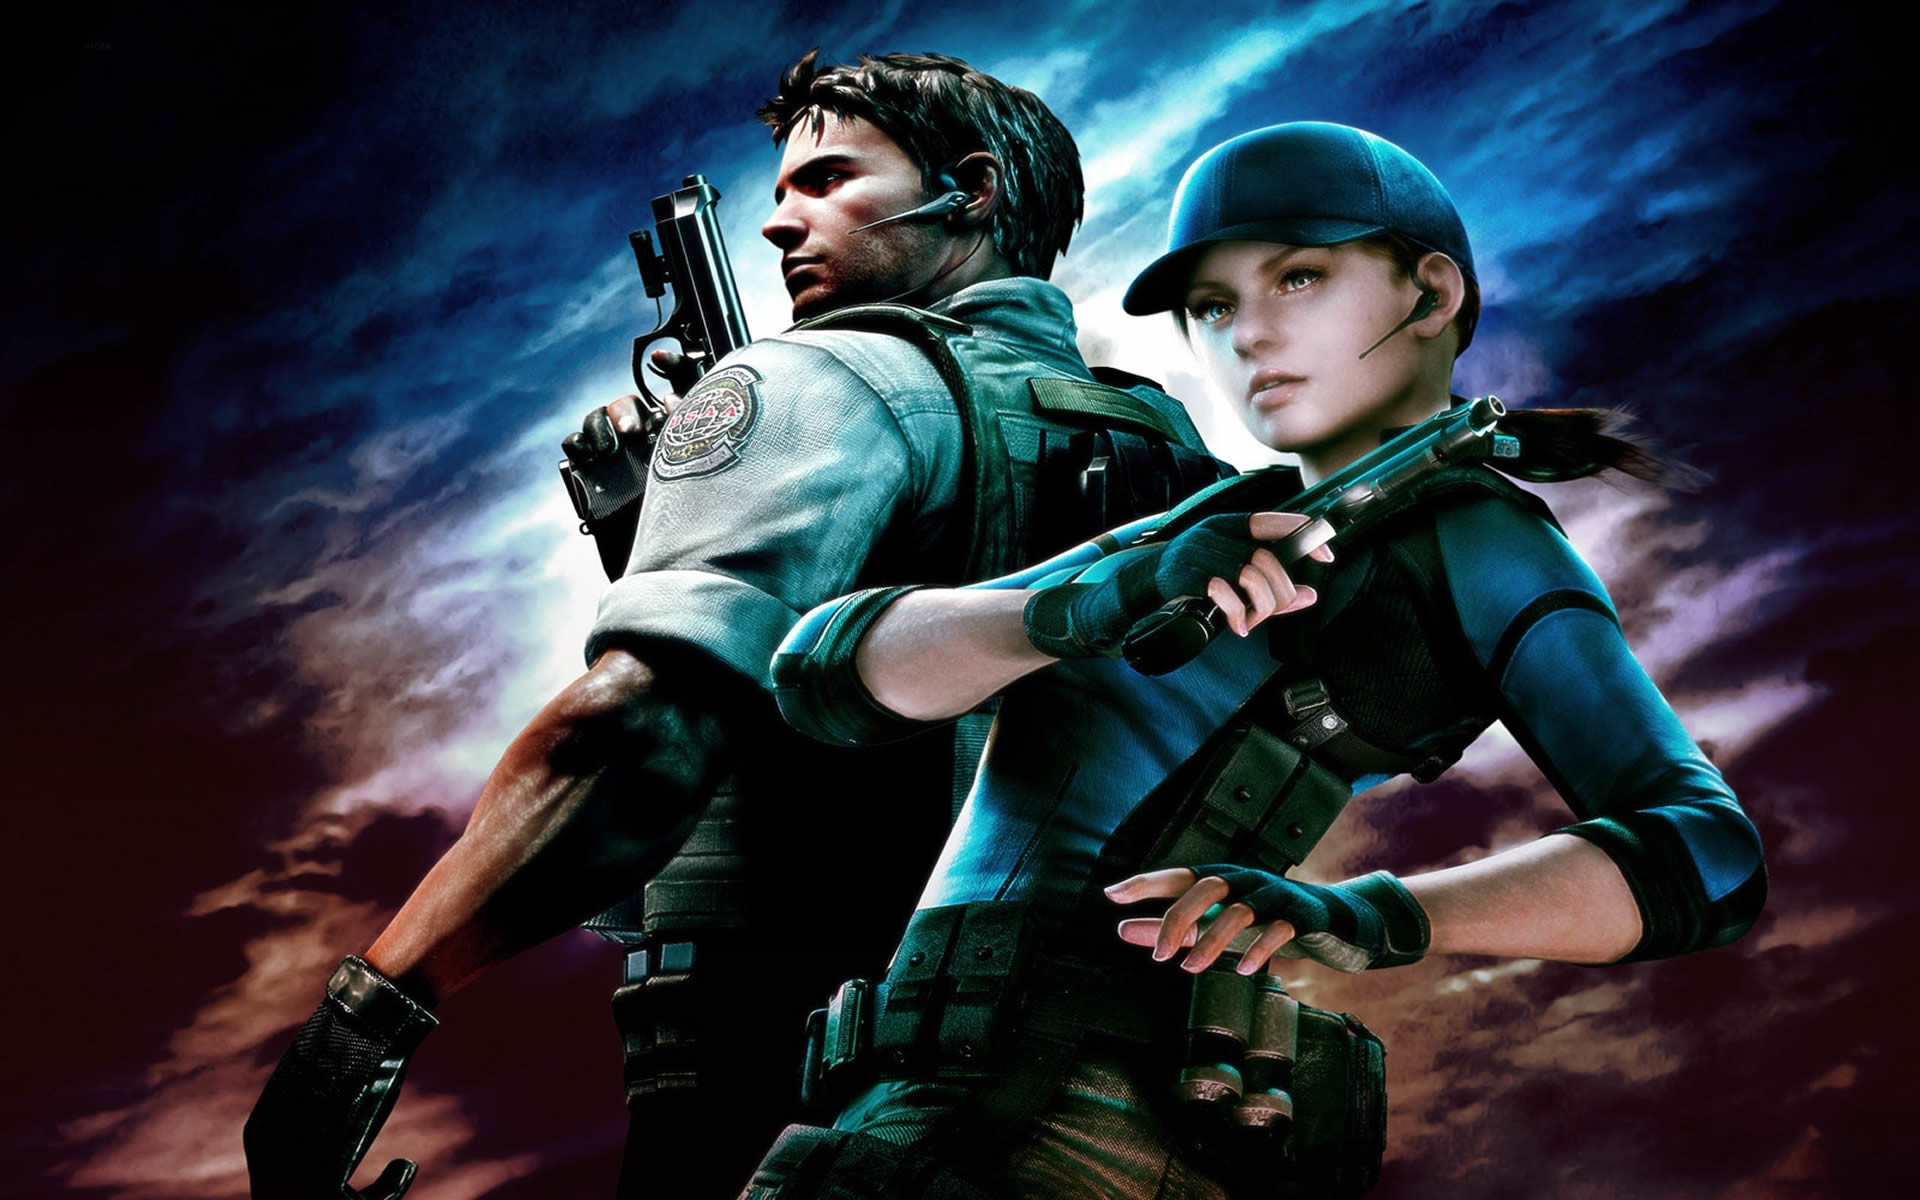 Resident Evil Jill Valentine Wallpaper 72 Pictures